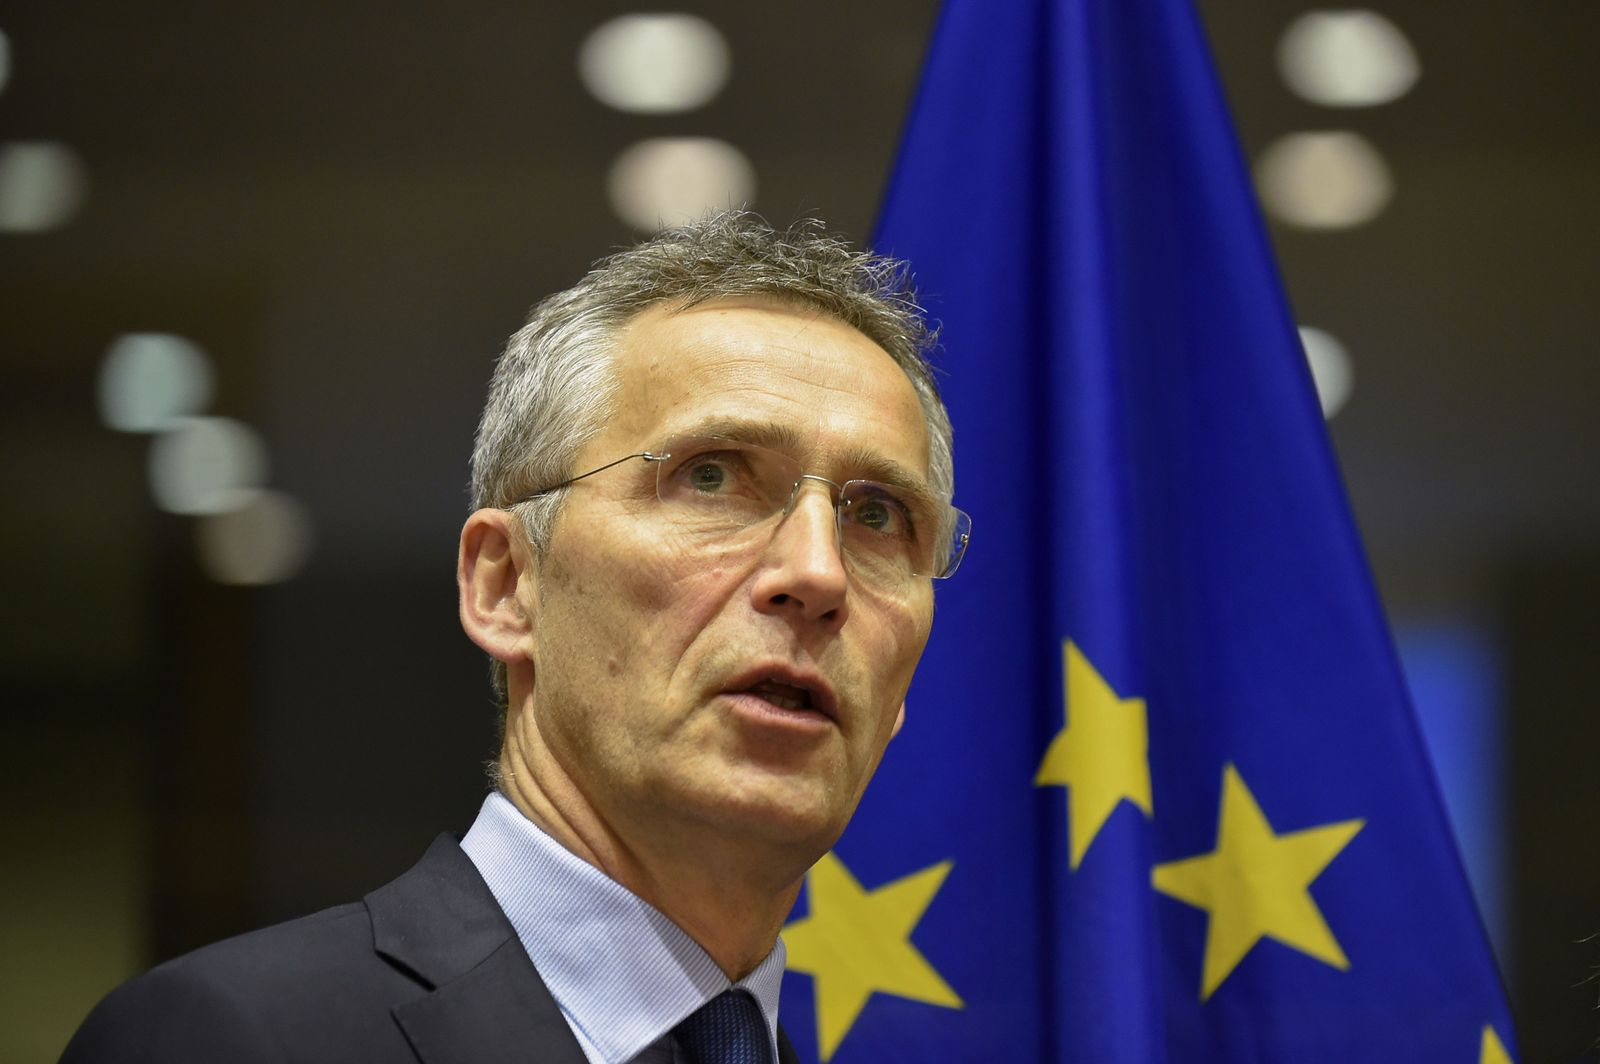 BELGIUM-EU-NATO